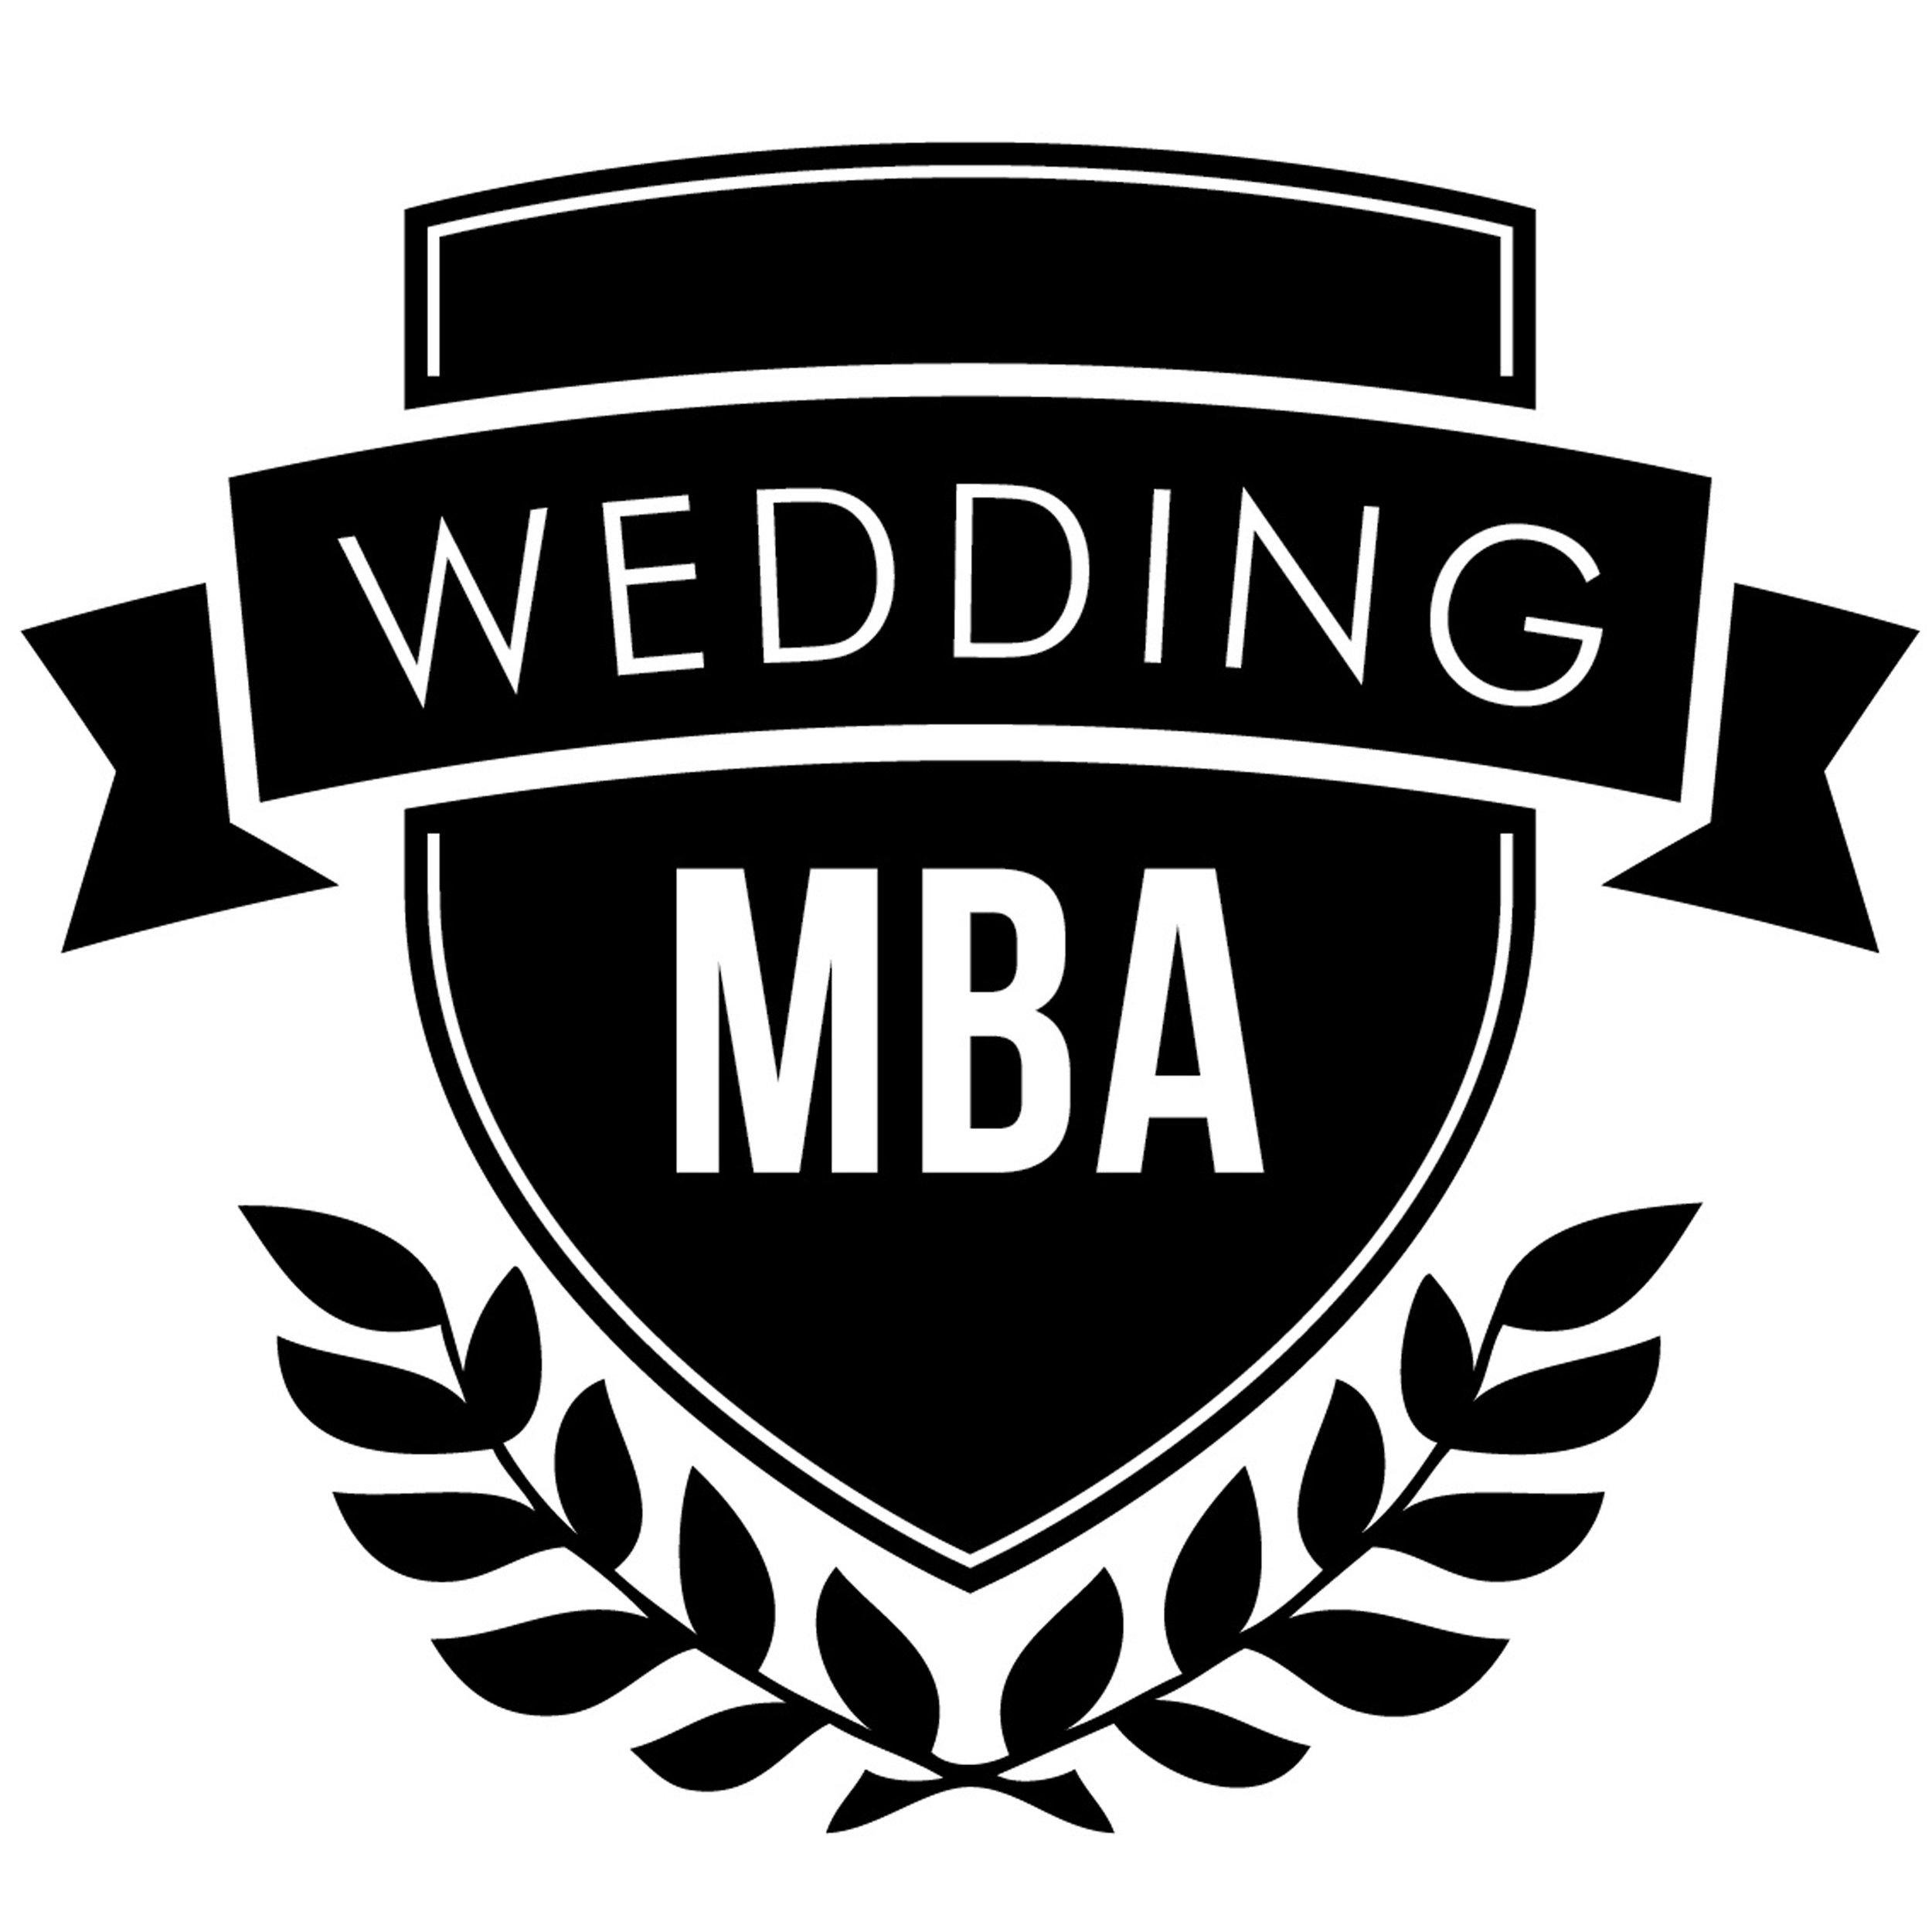 WeddingMBA.jpg